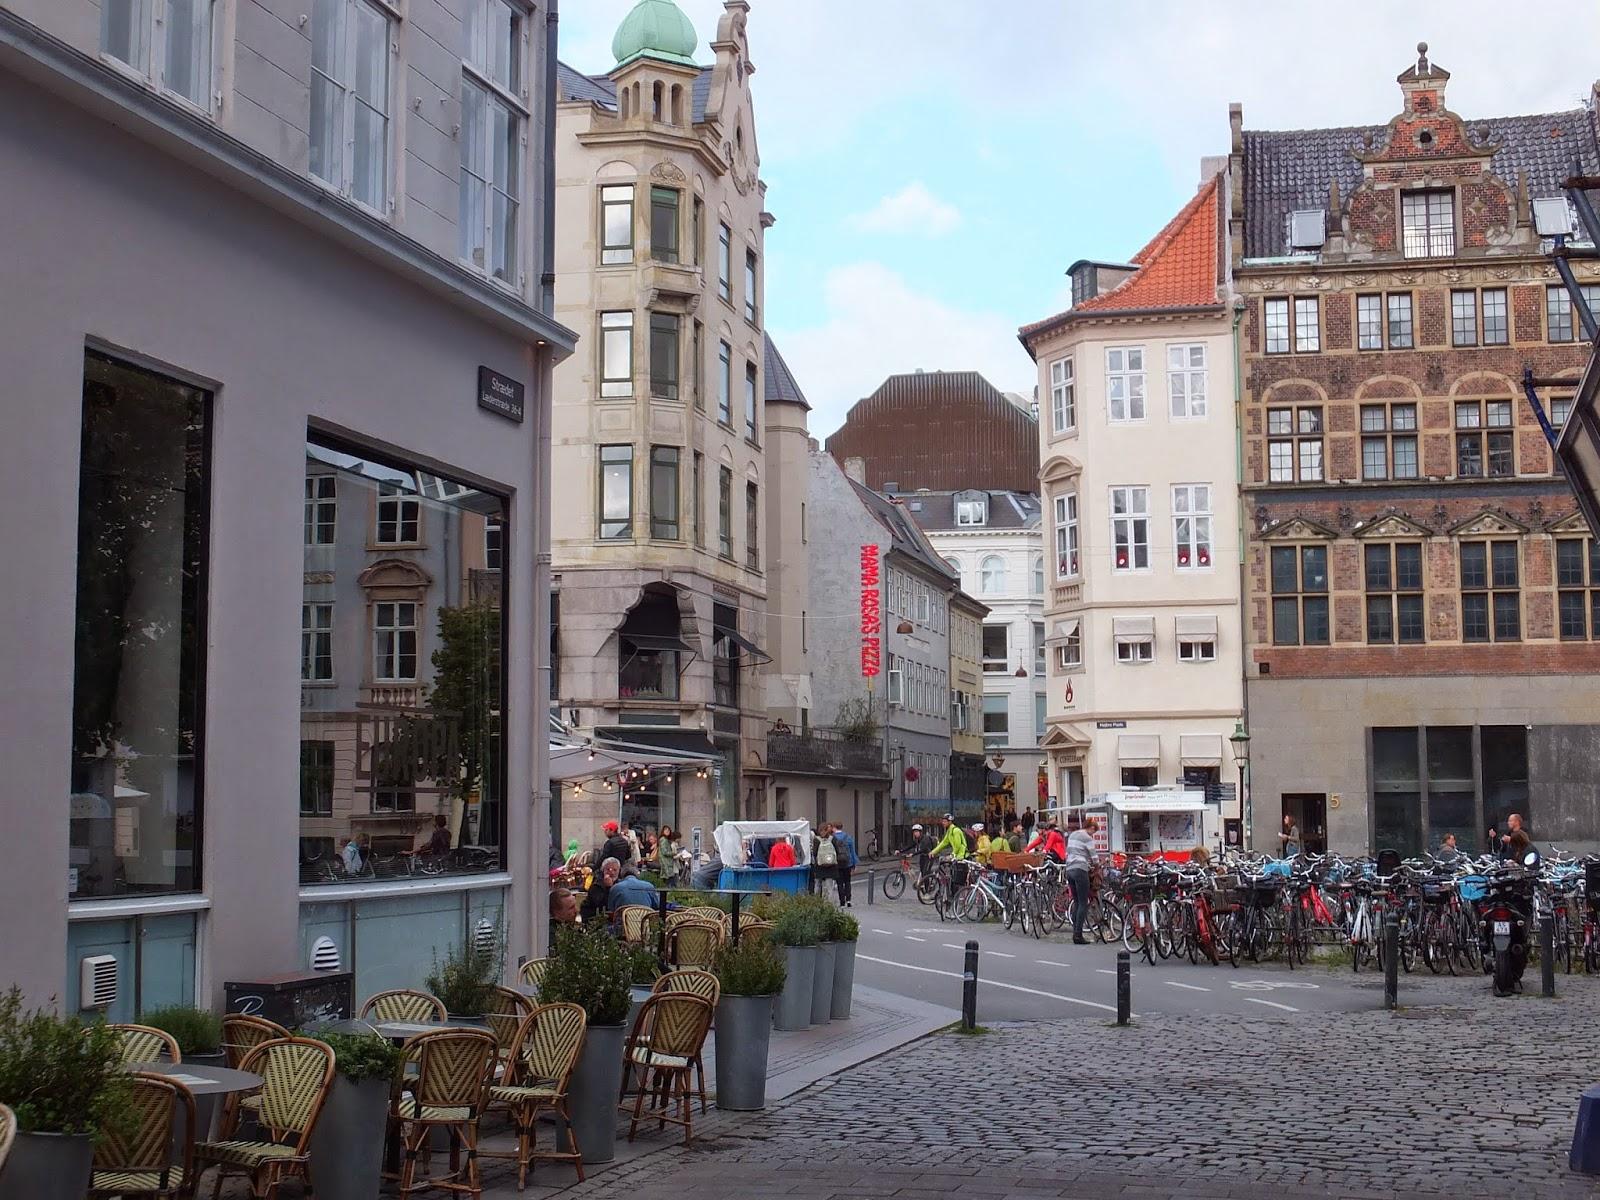 copenhagen-road コペンハーゲンの街中4